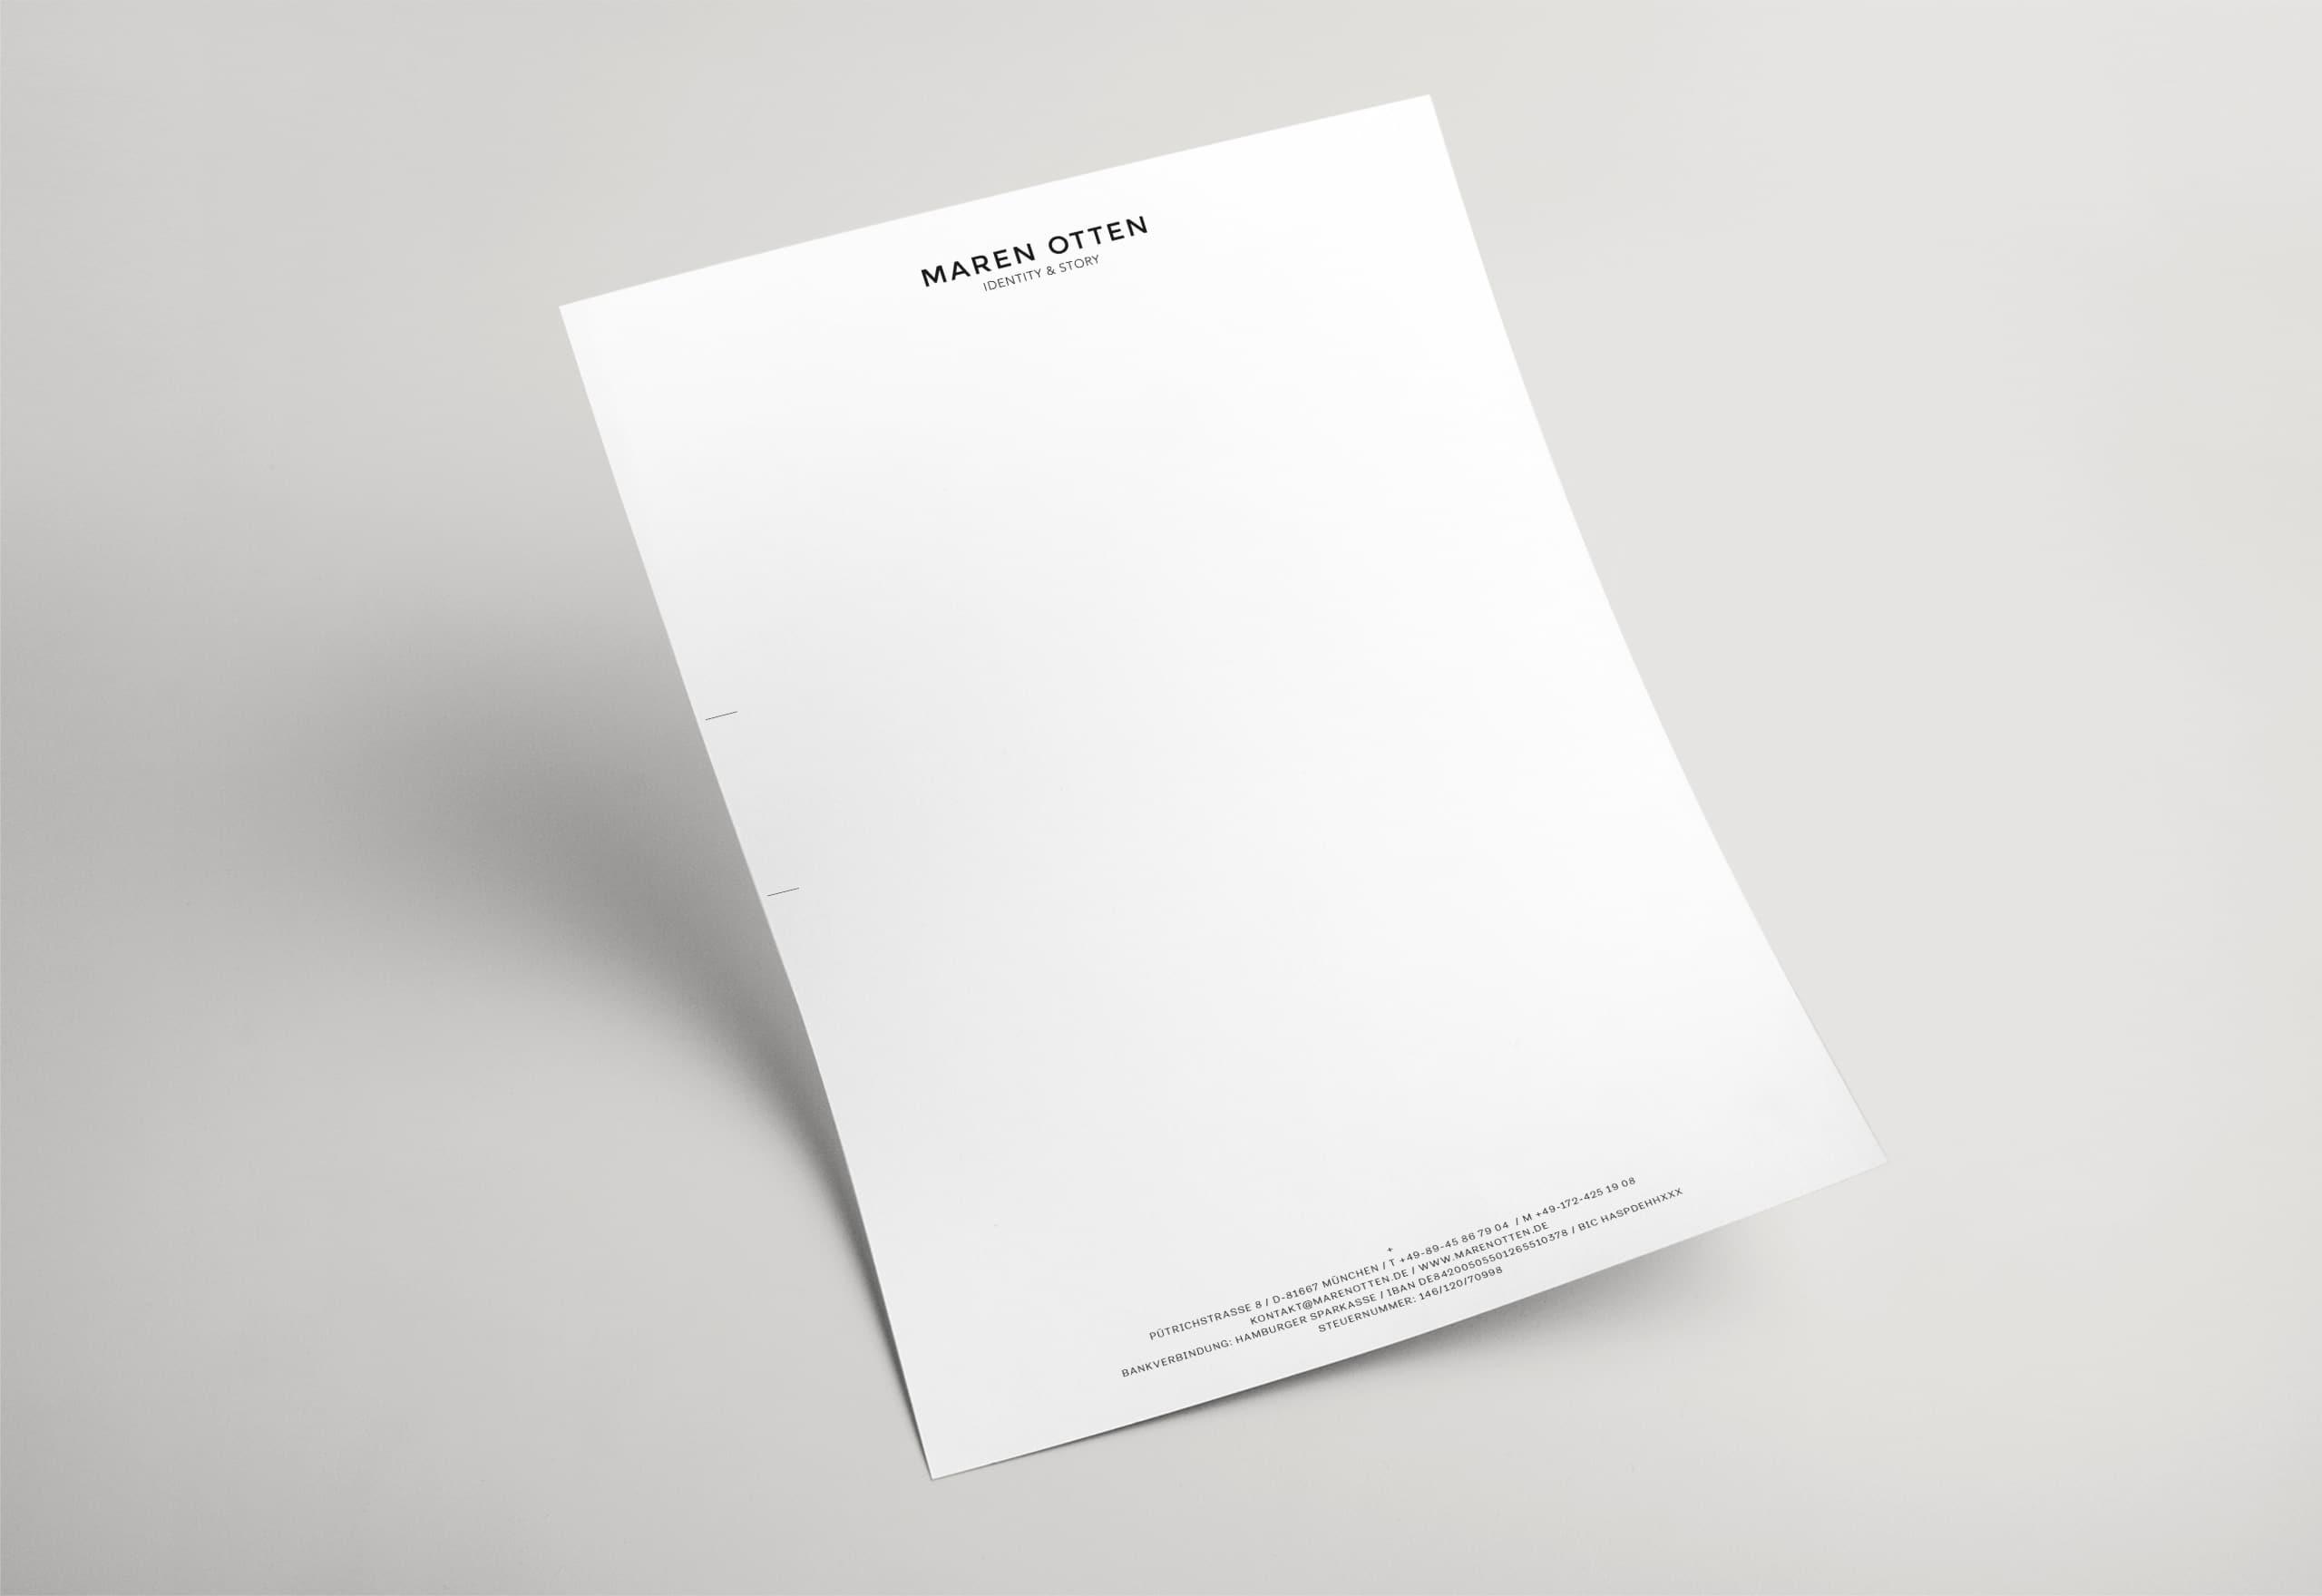 Design Maren Otten